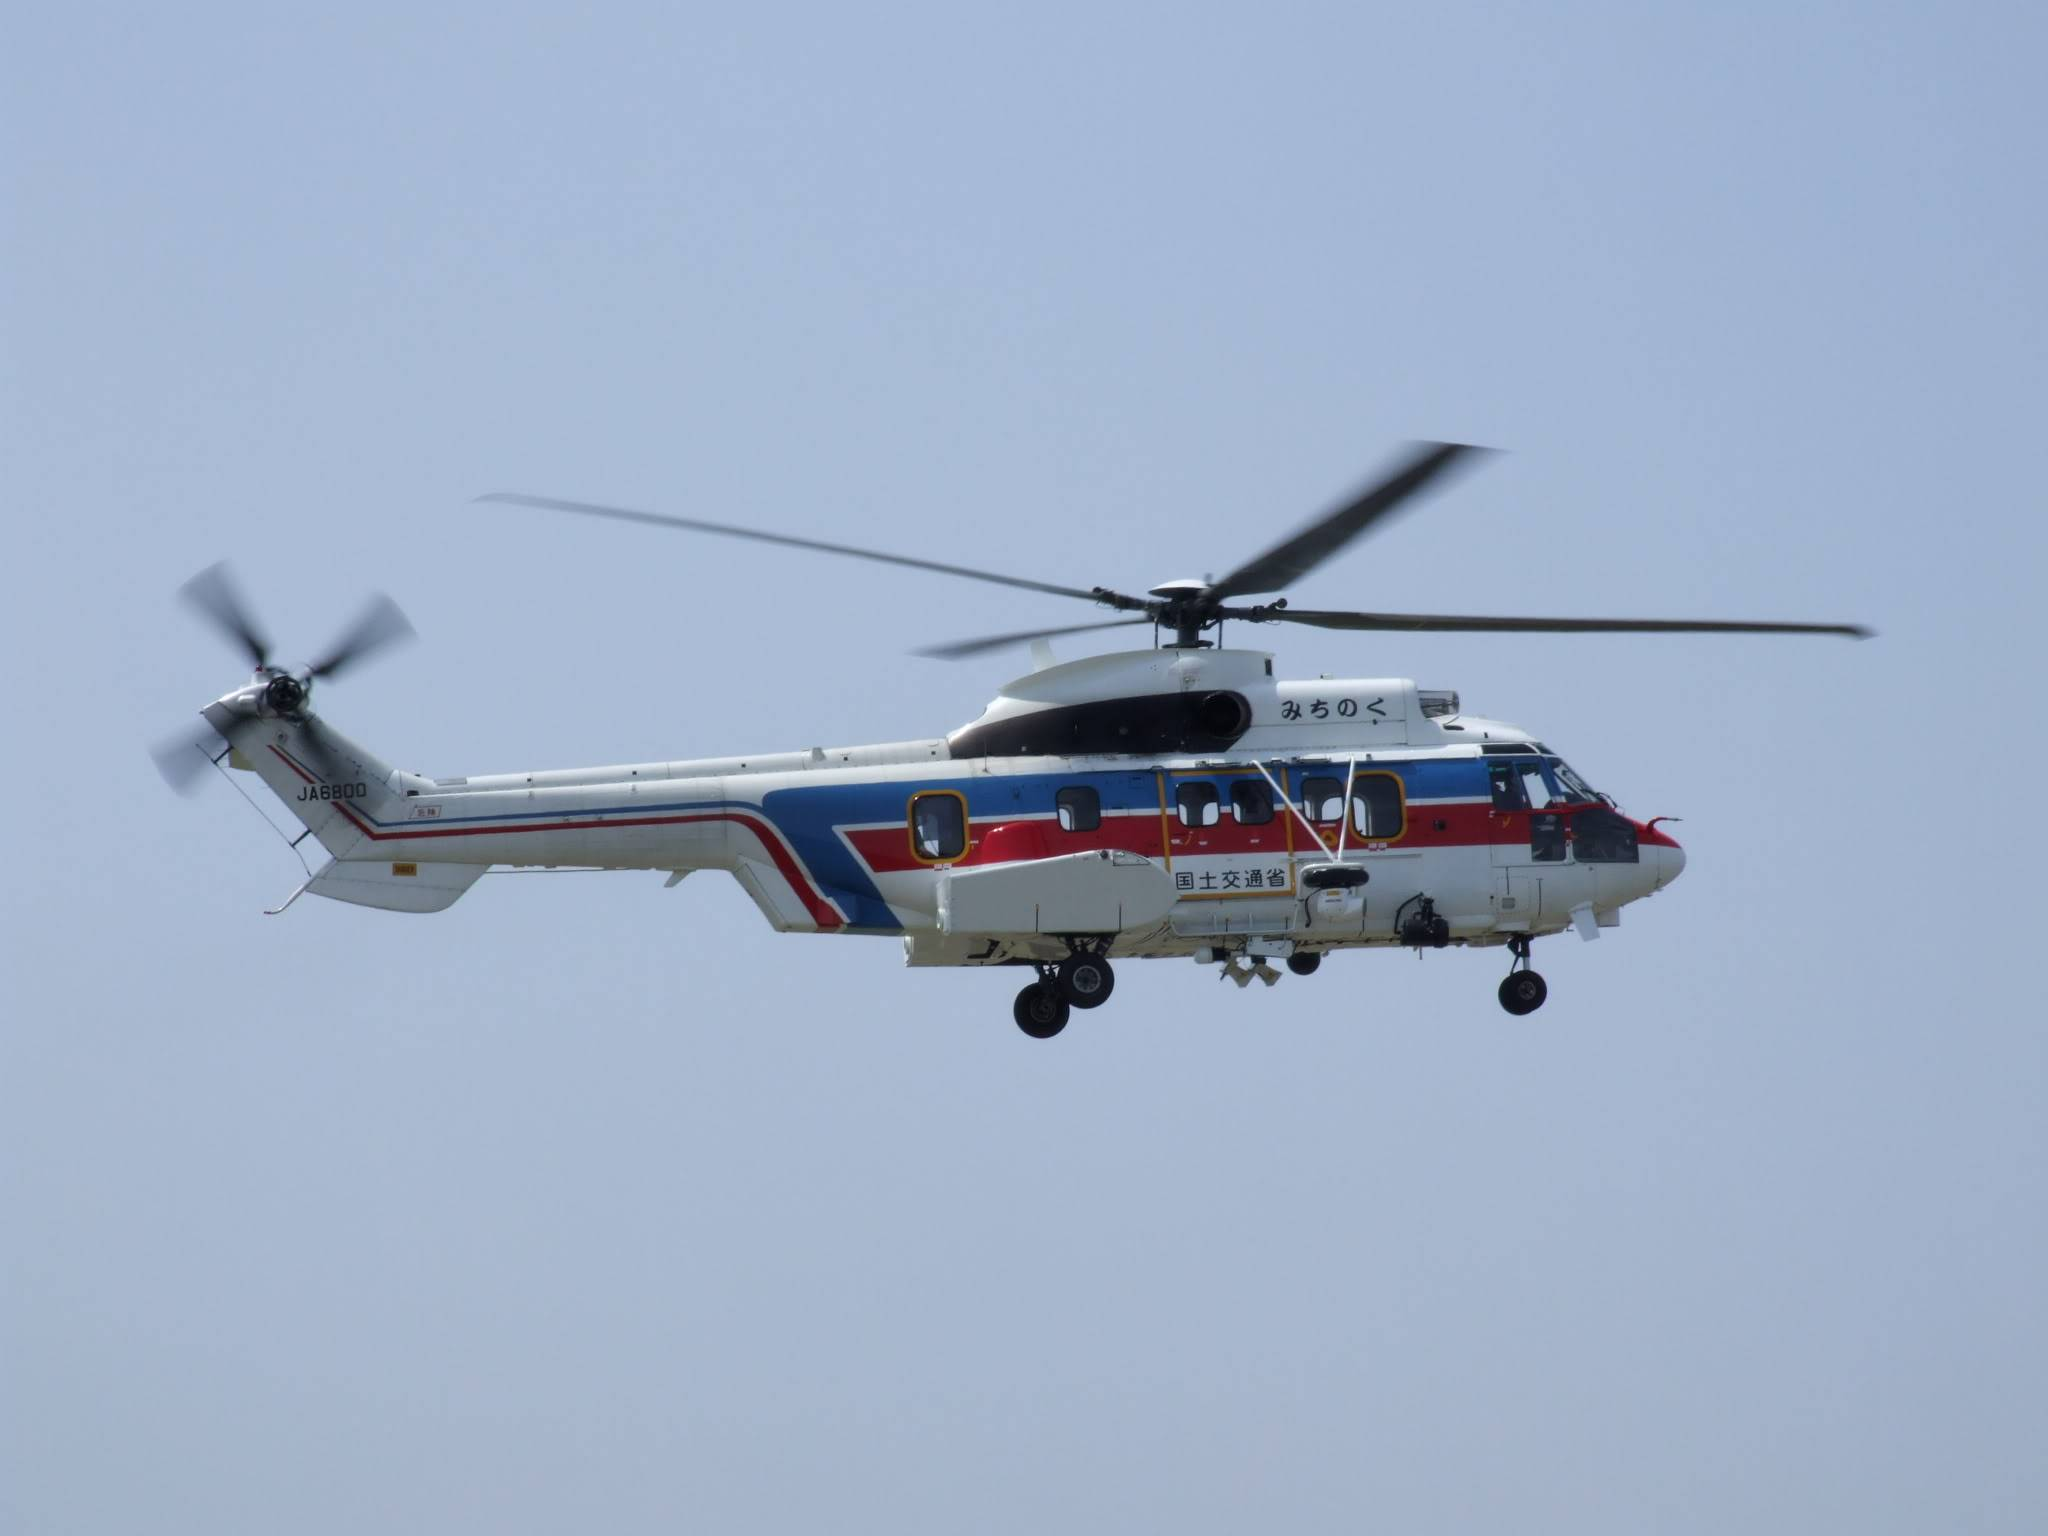 Helicopter | ヘリコプター | Trực thăng 89984dbd3d6a8511079a9e4dbb92346b